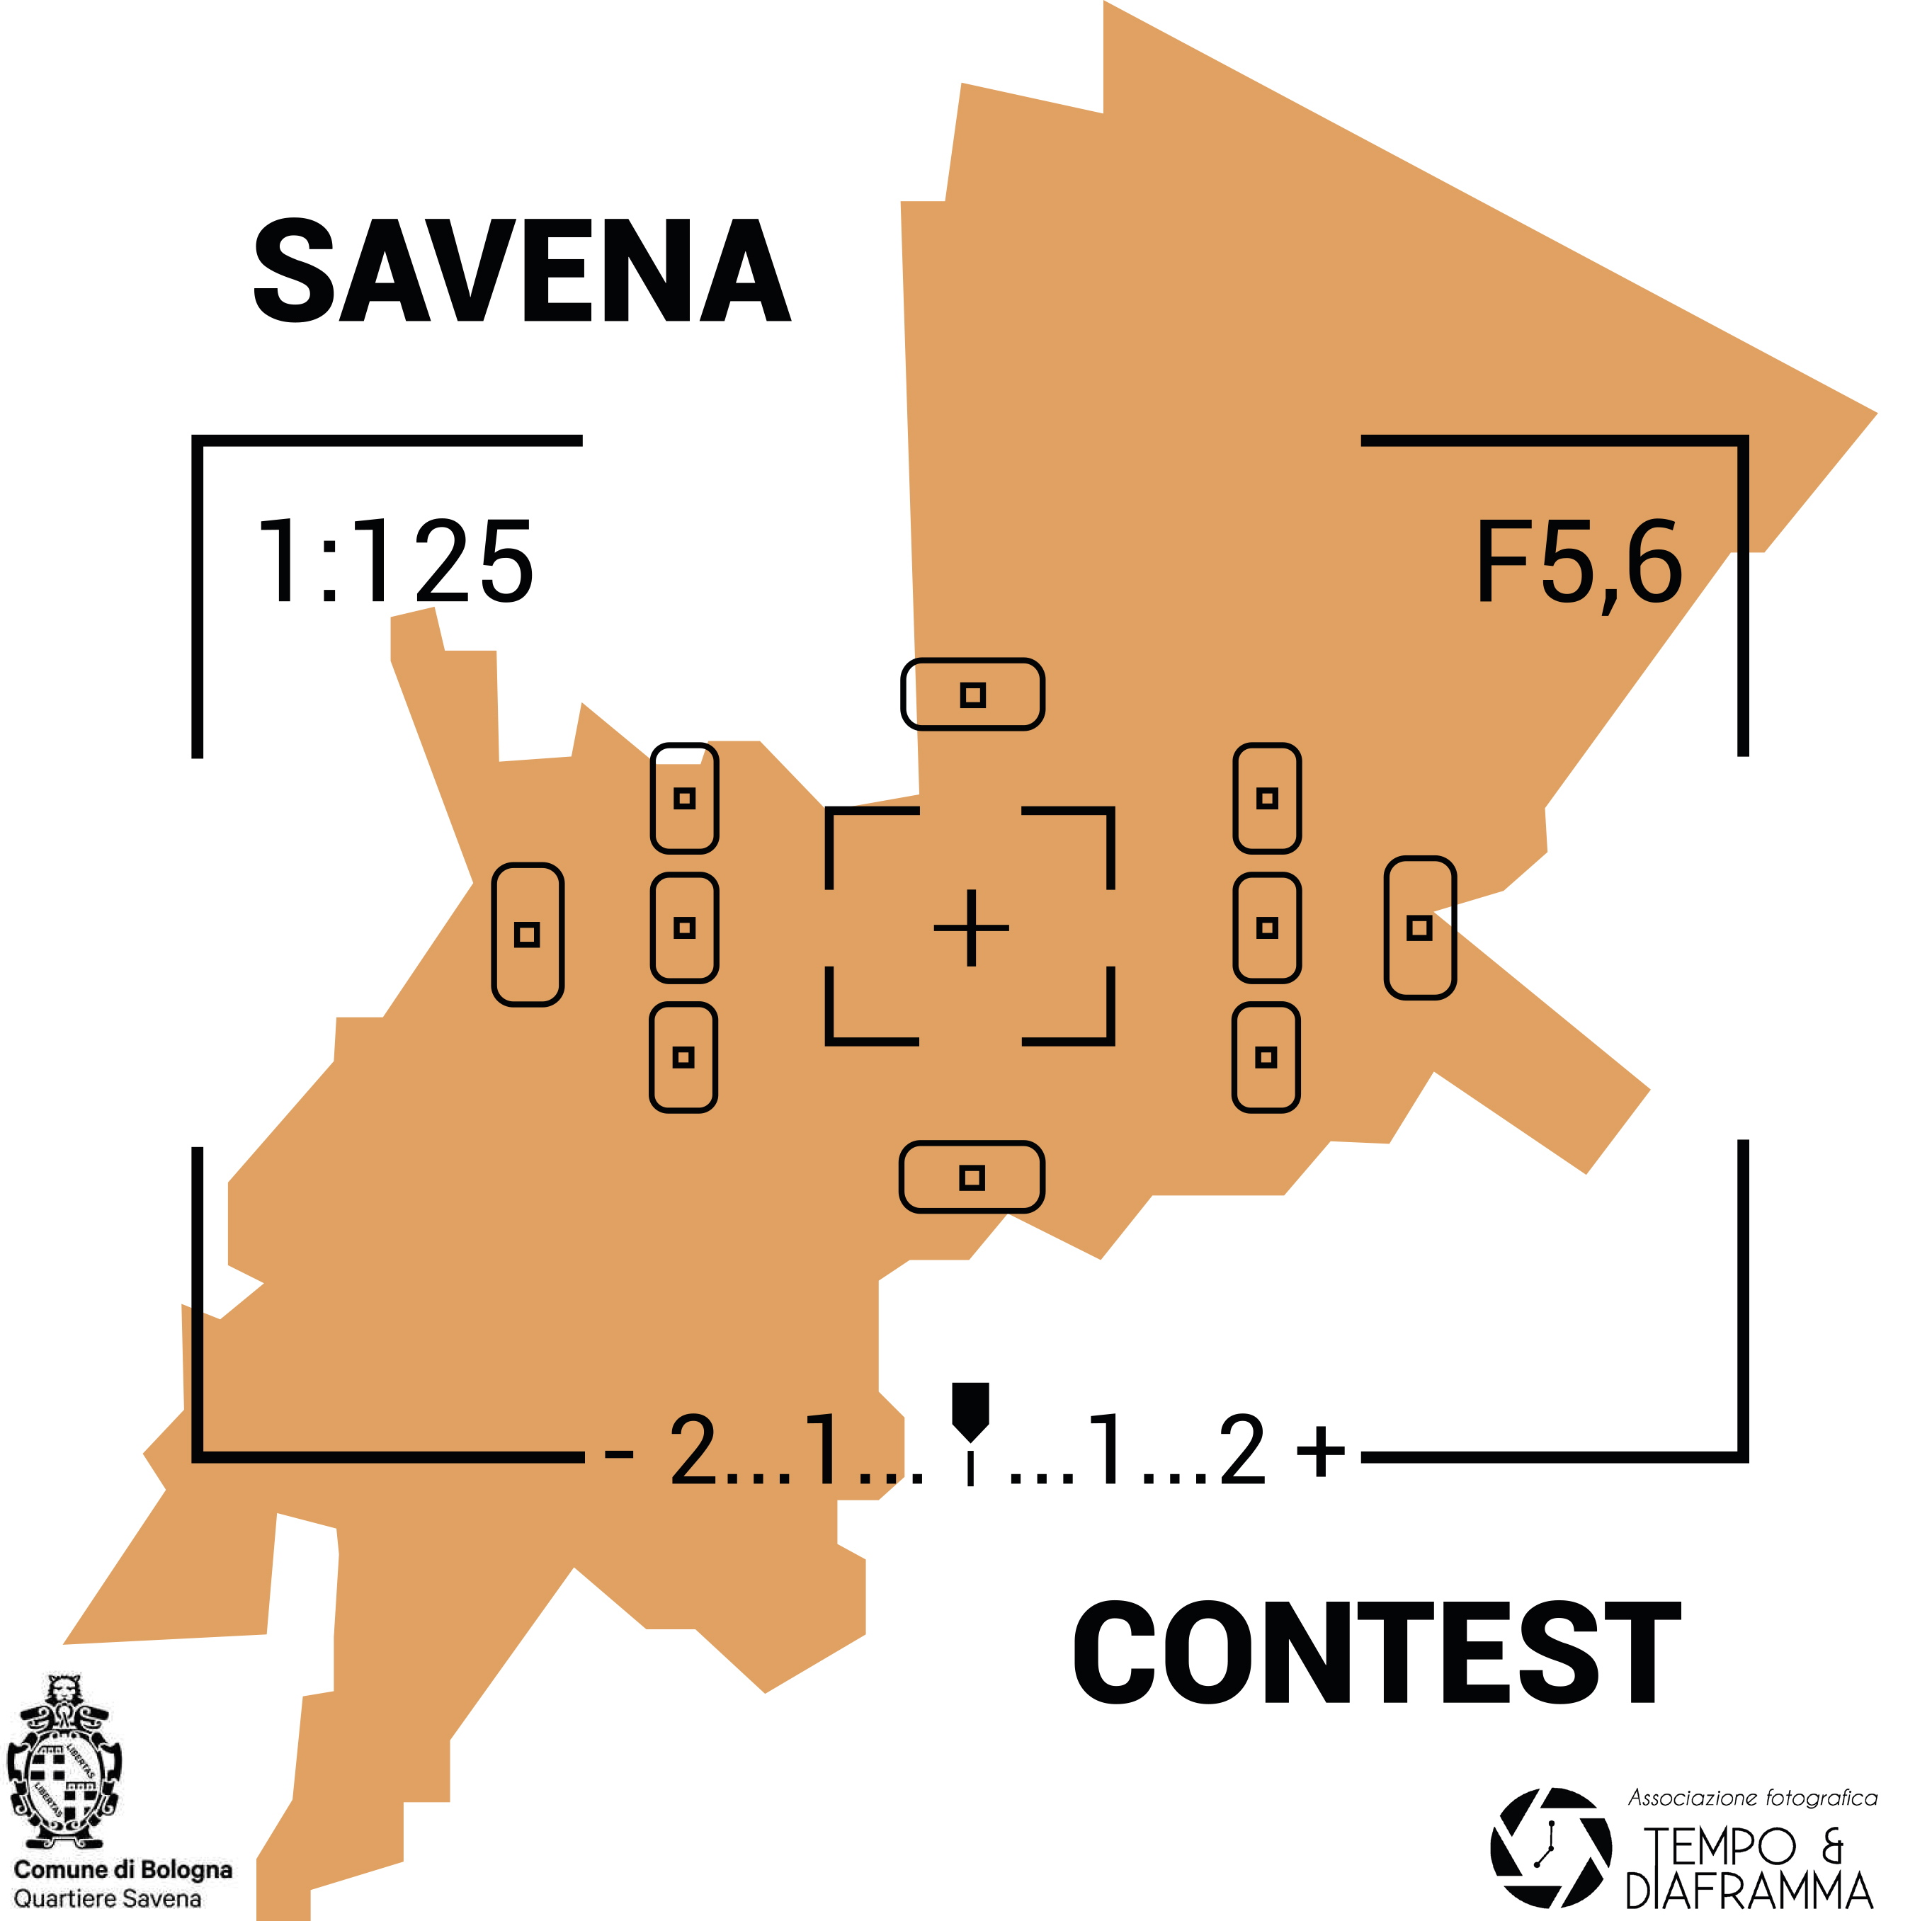 Savena Contest